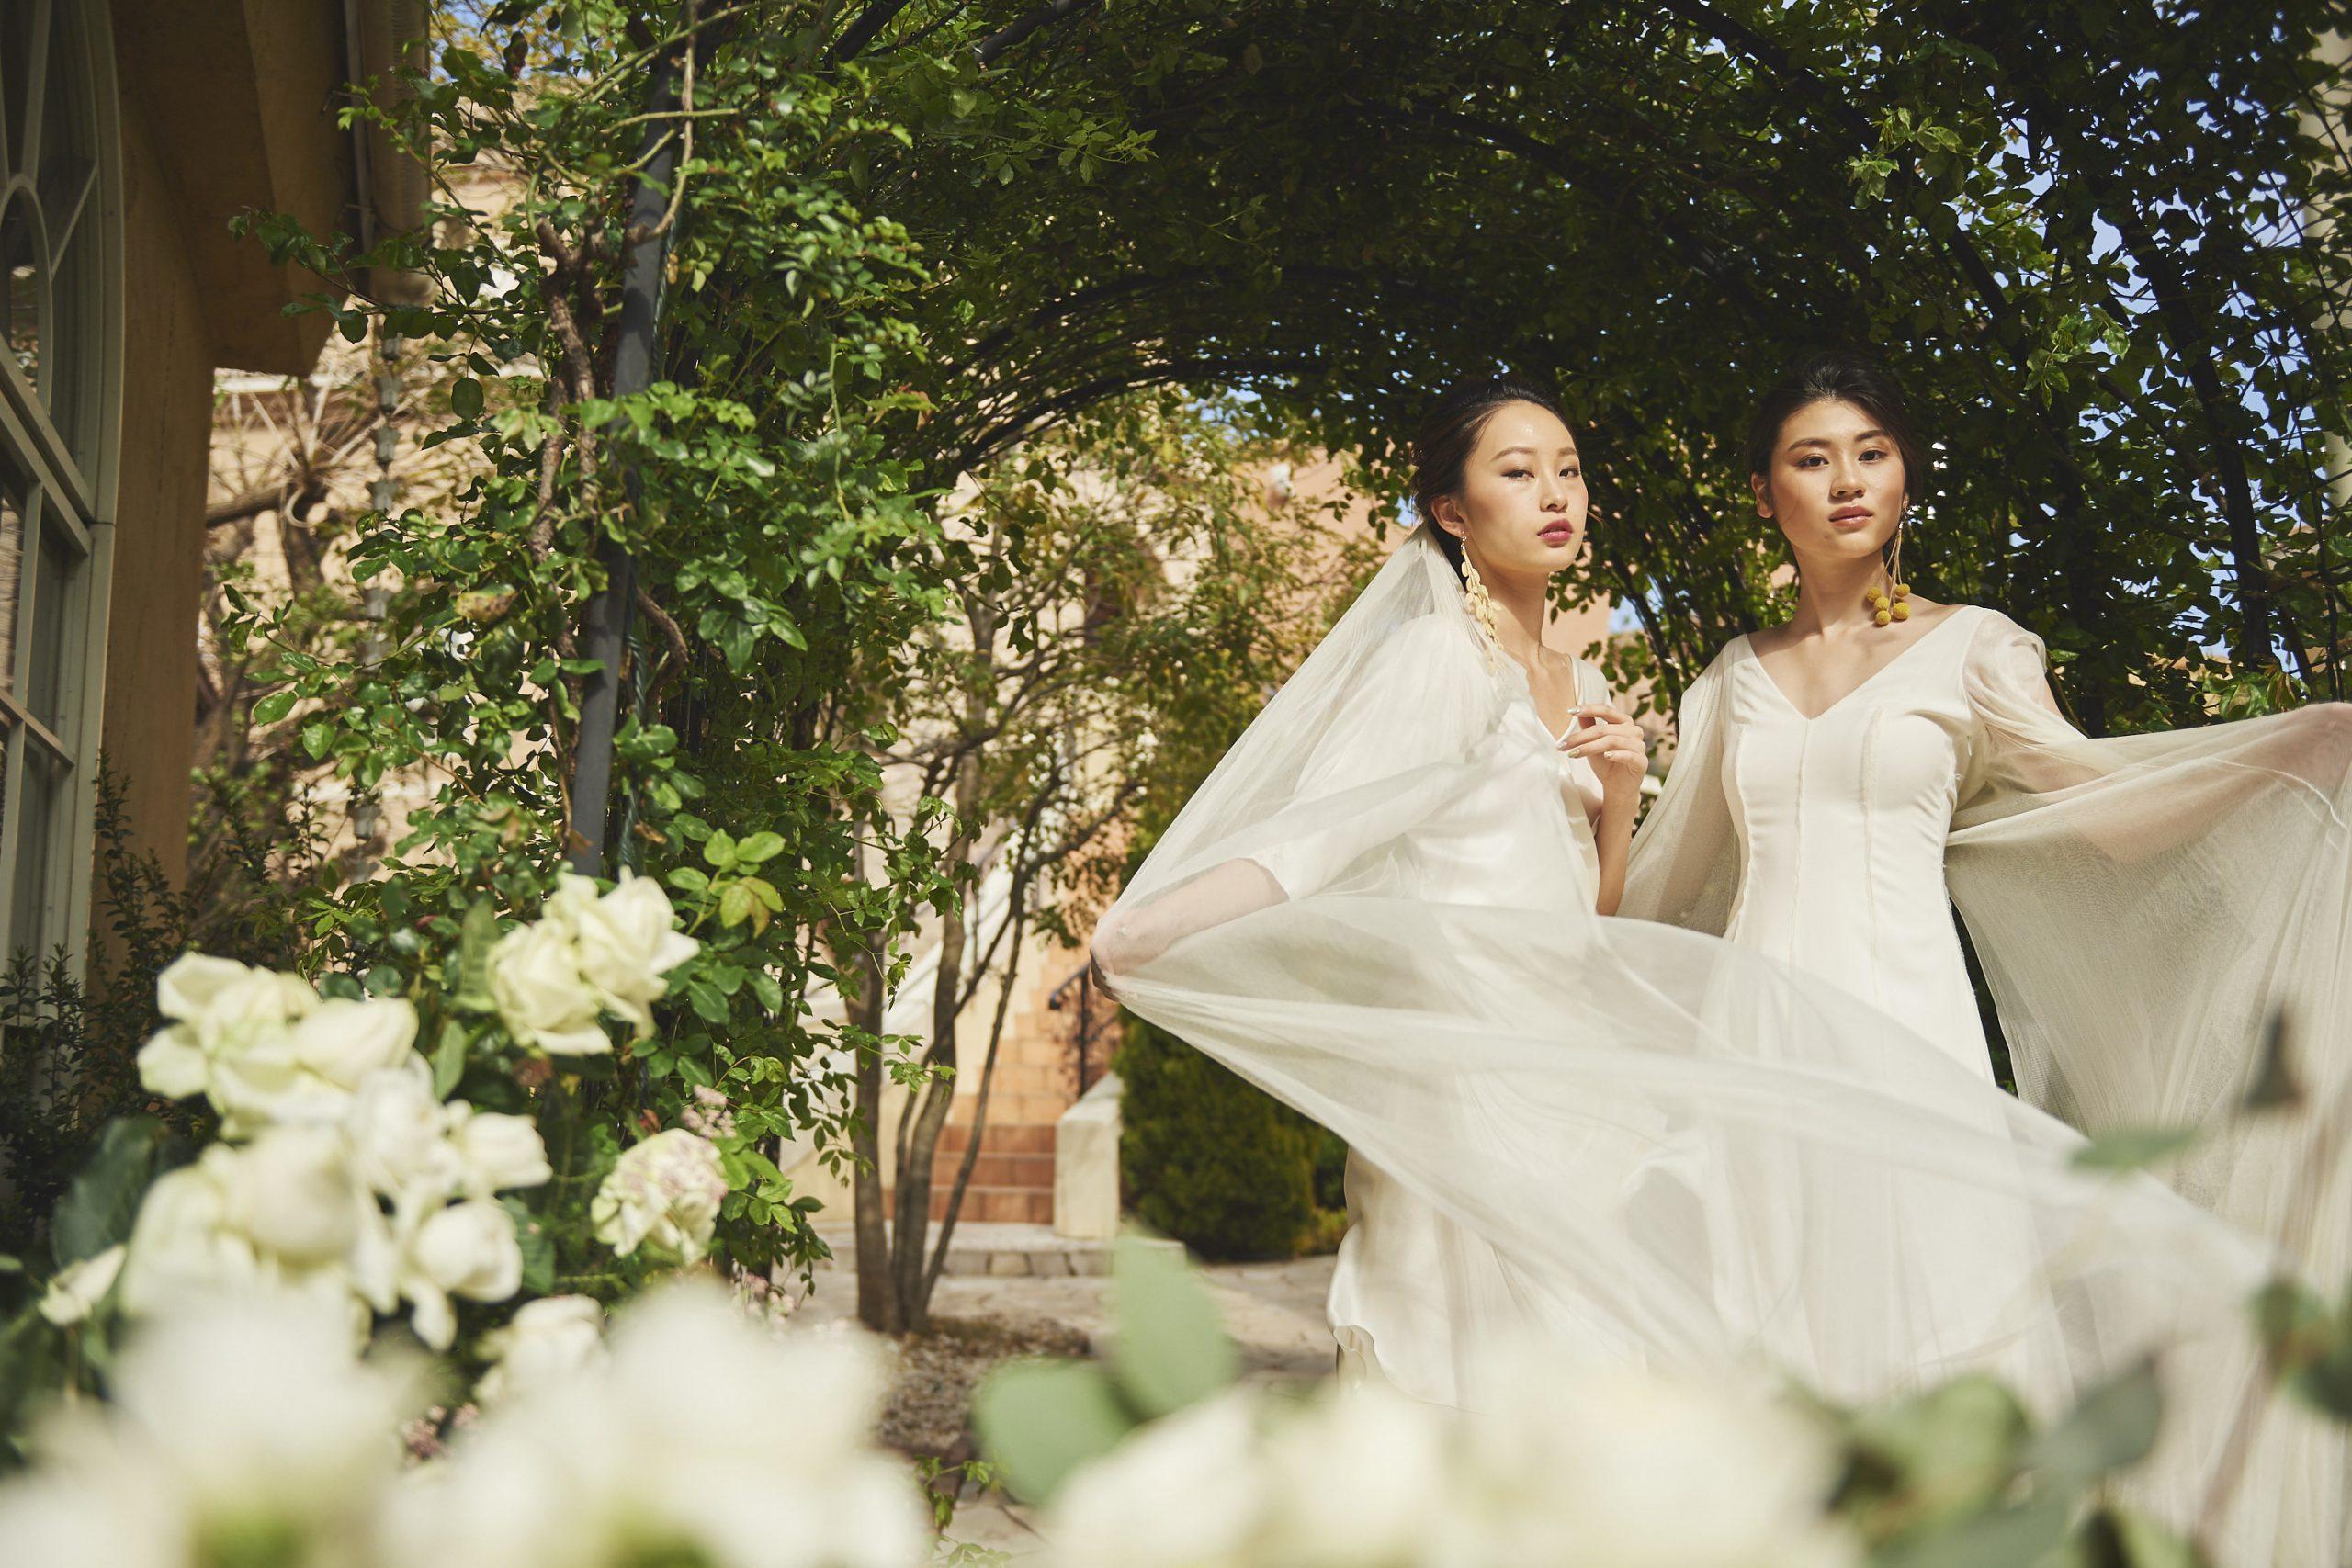 花嫁 Wedding